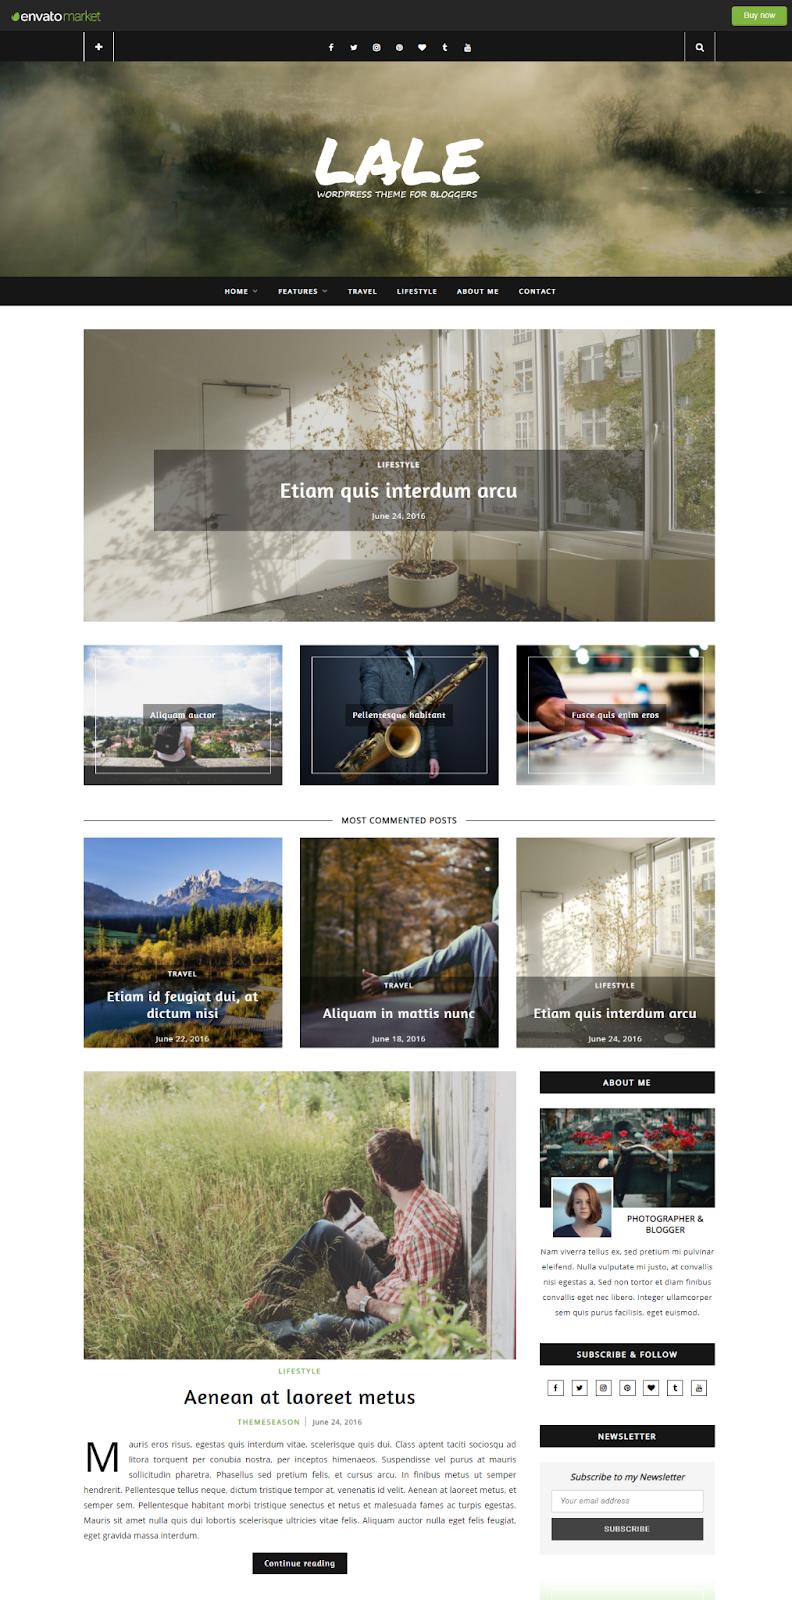 Best WordPress Instagram Themes Lale